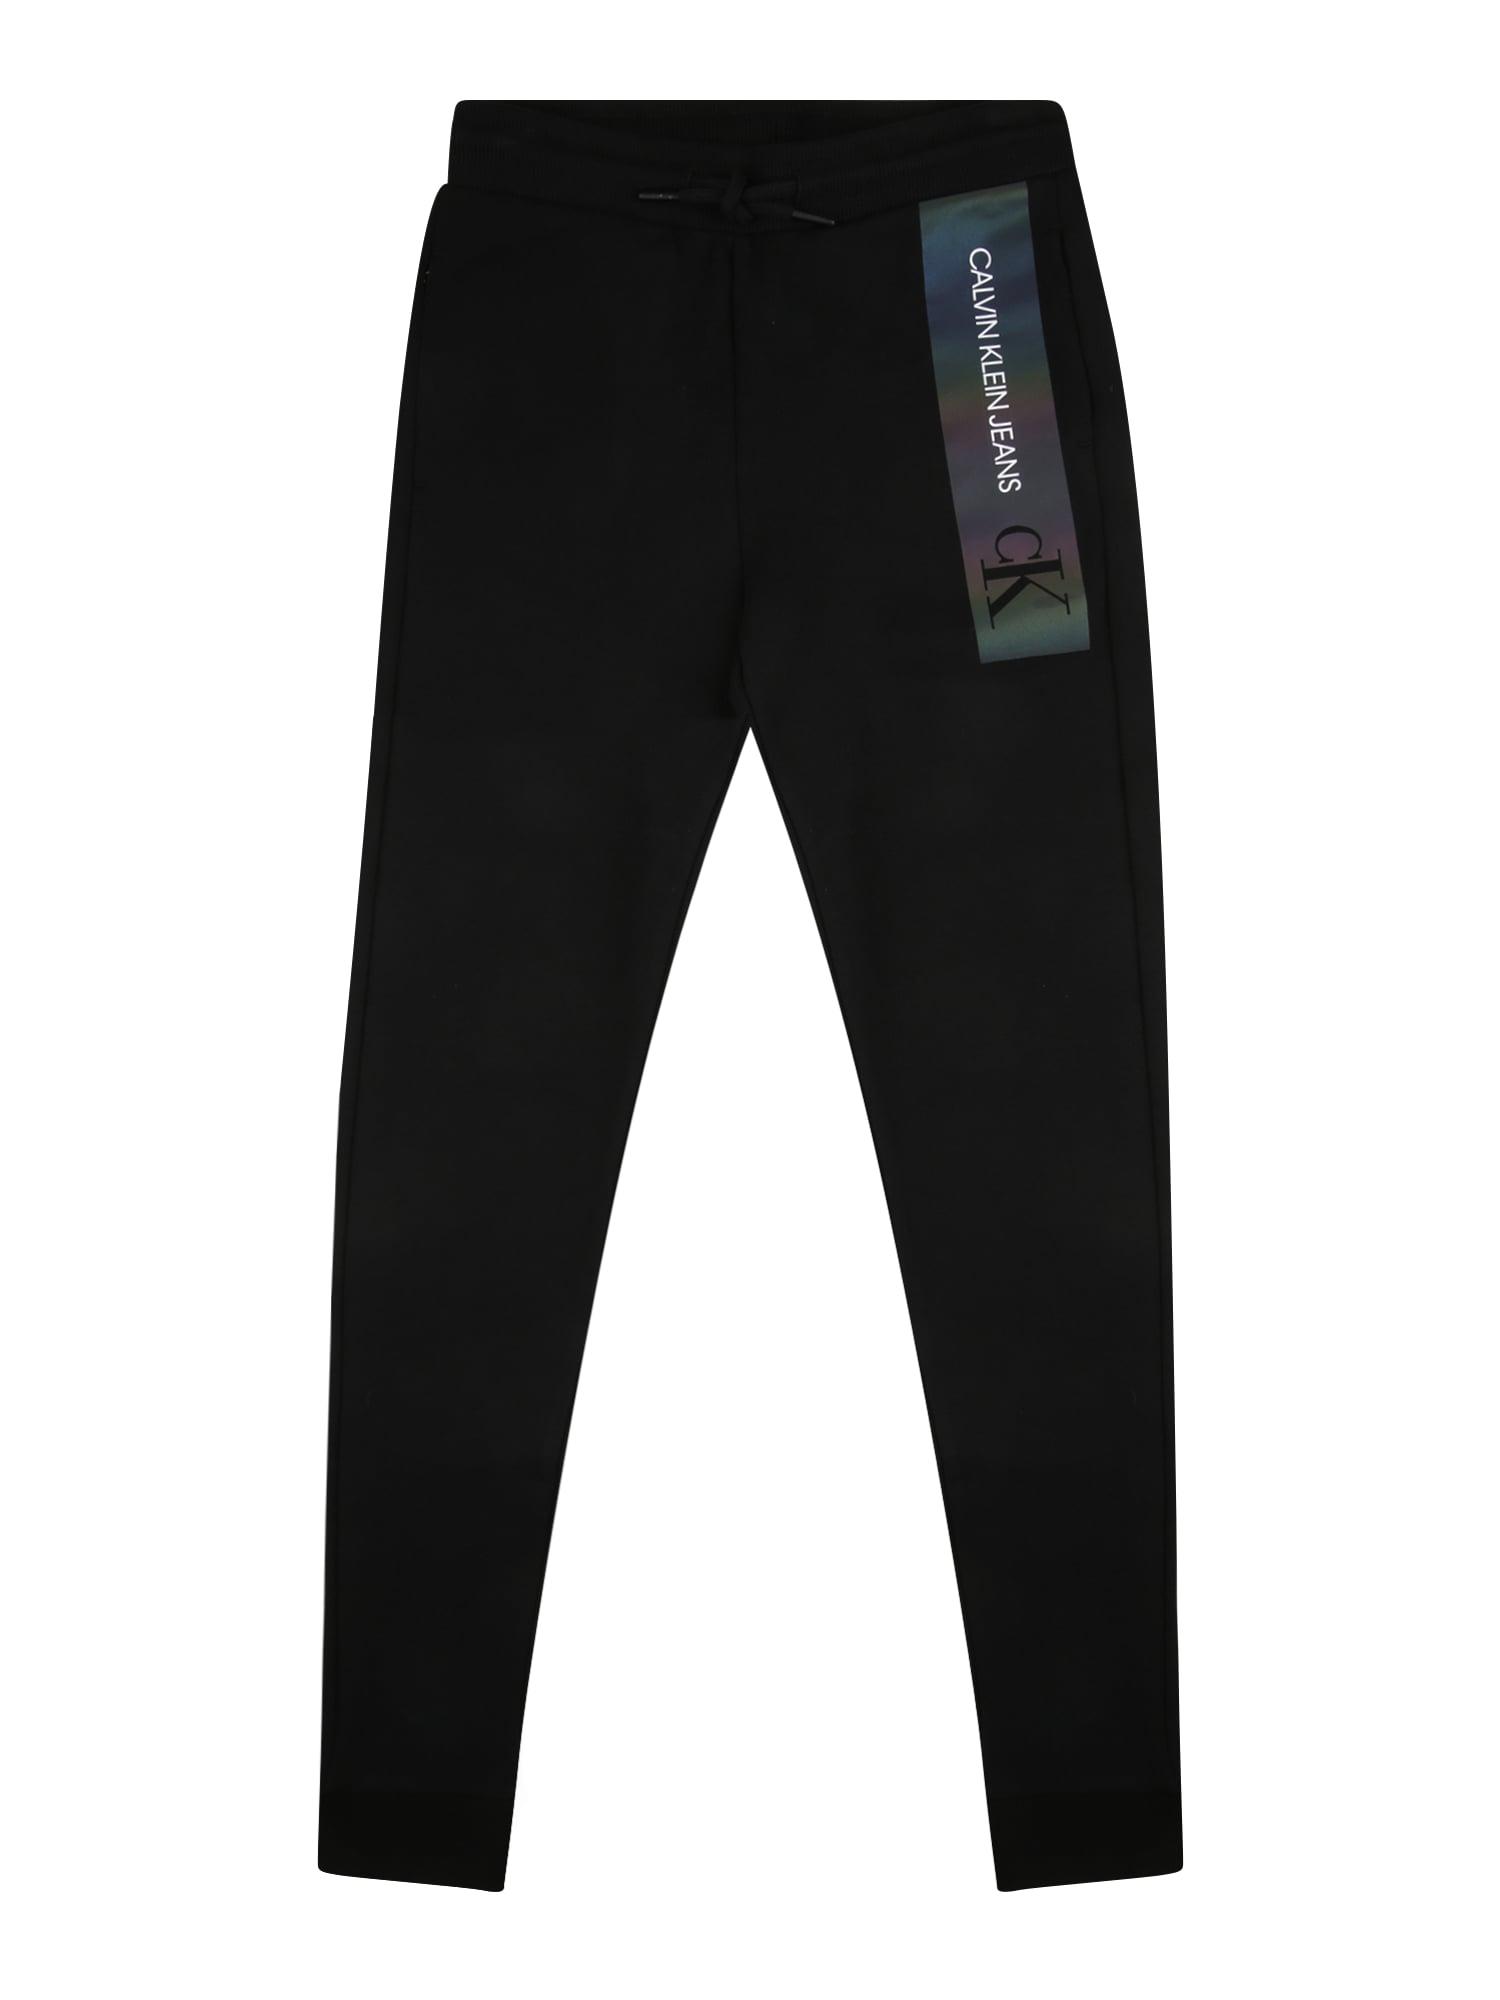 Calvin Klein Jeans Kelnės juoda / balta / mišrios spalvos